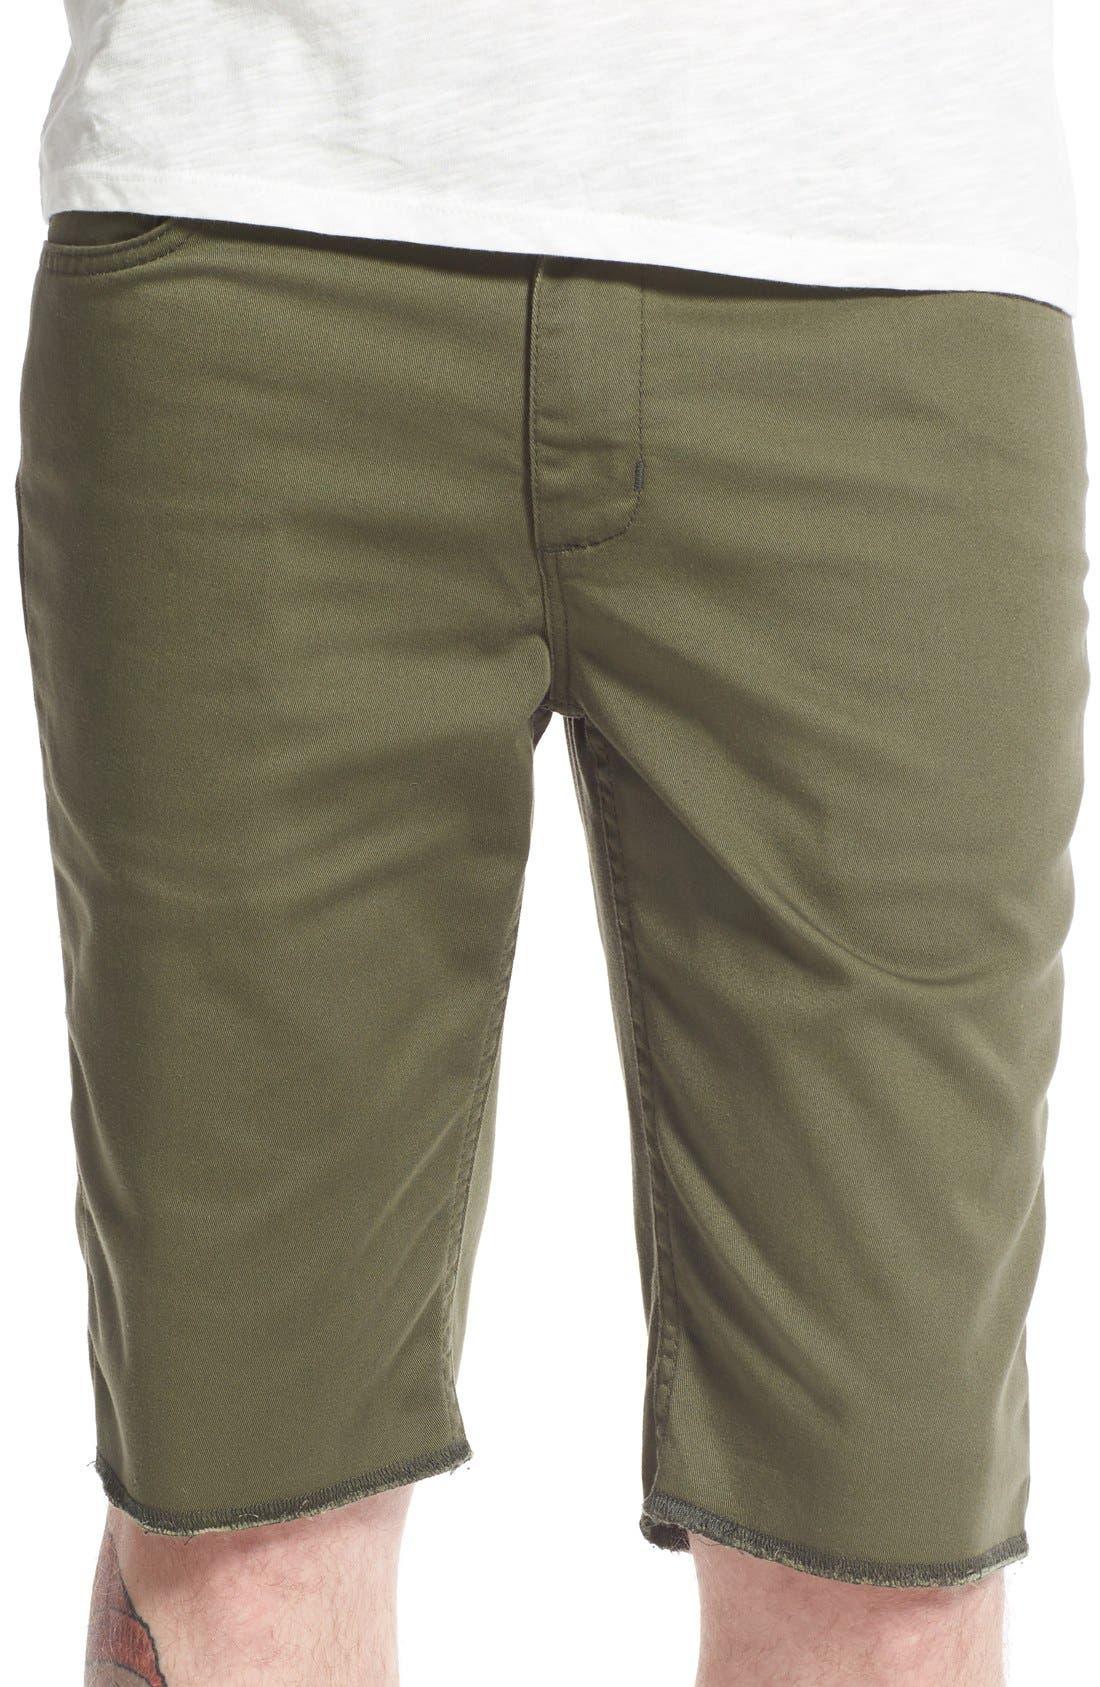 'Covina II - Anthony Van Engelen' Twill Shorts,                         Main,                         color, Grape Leaf